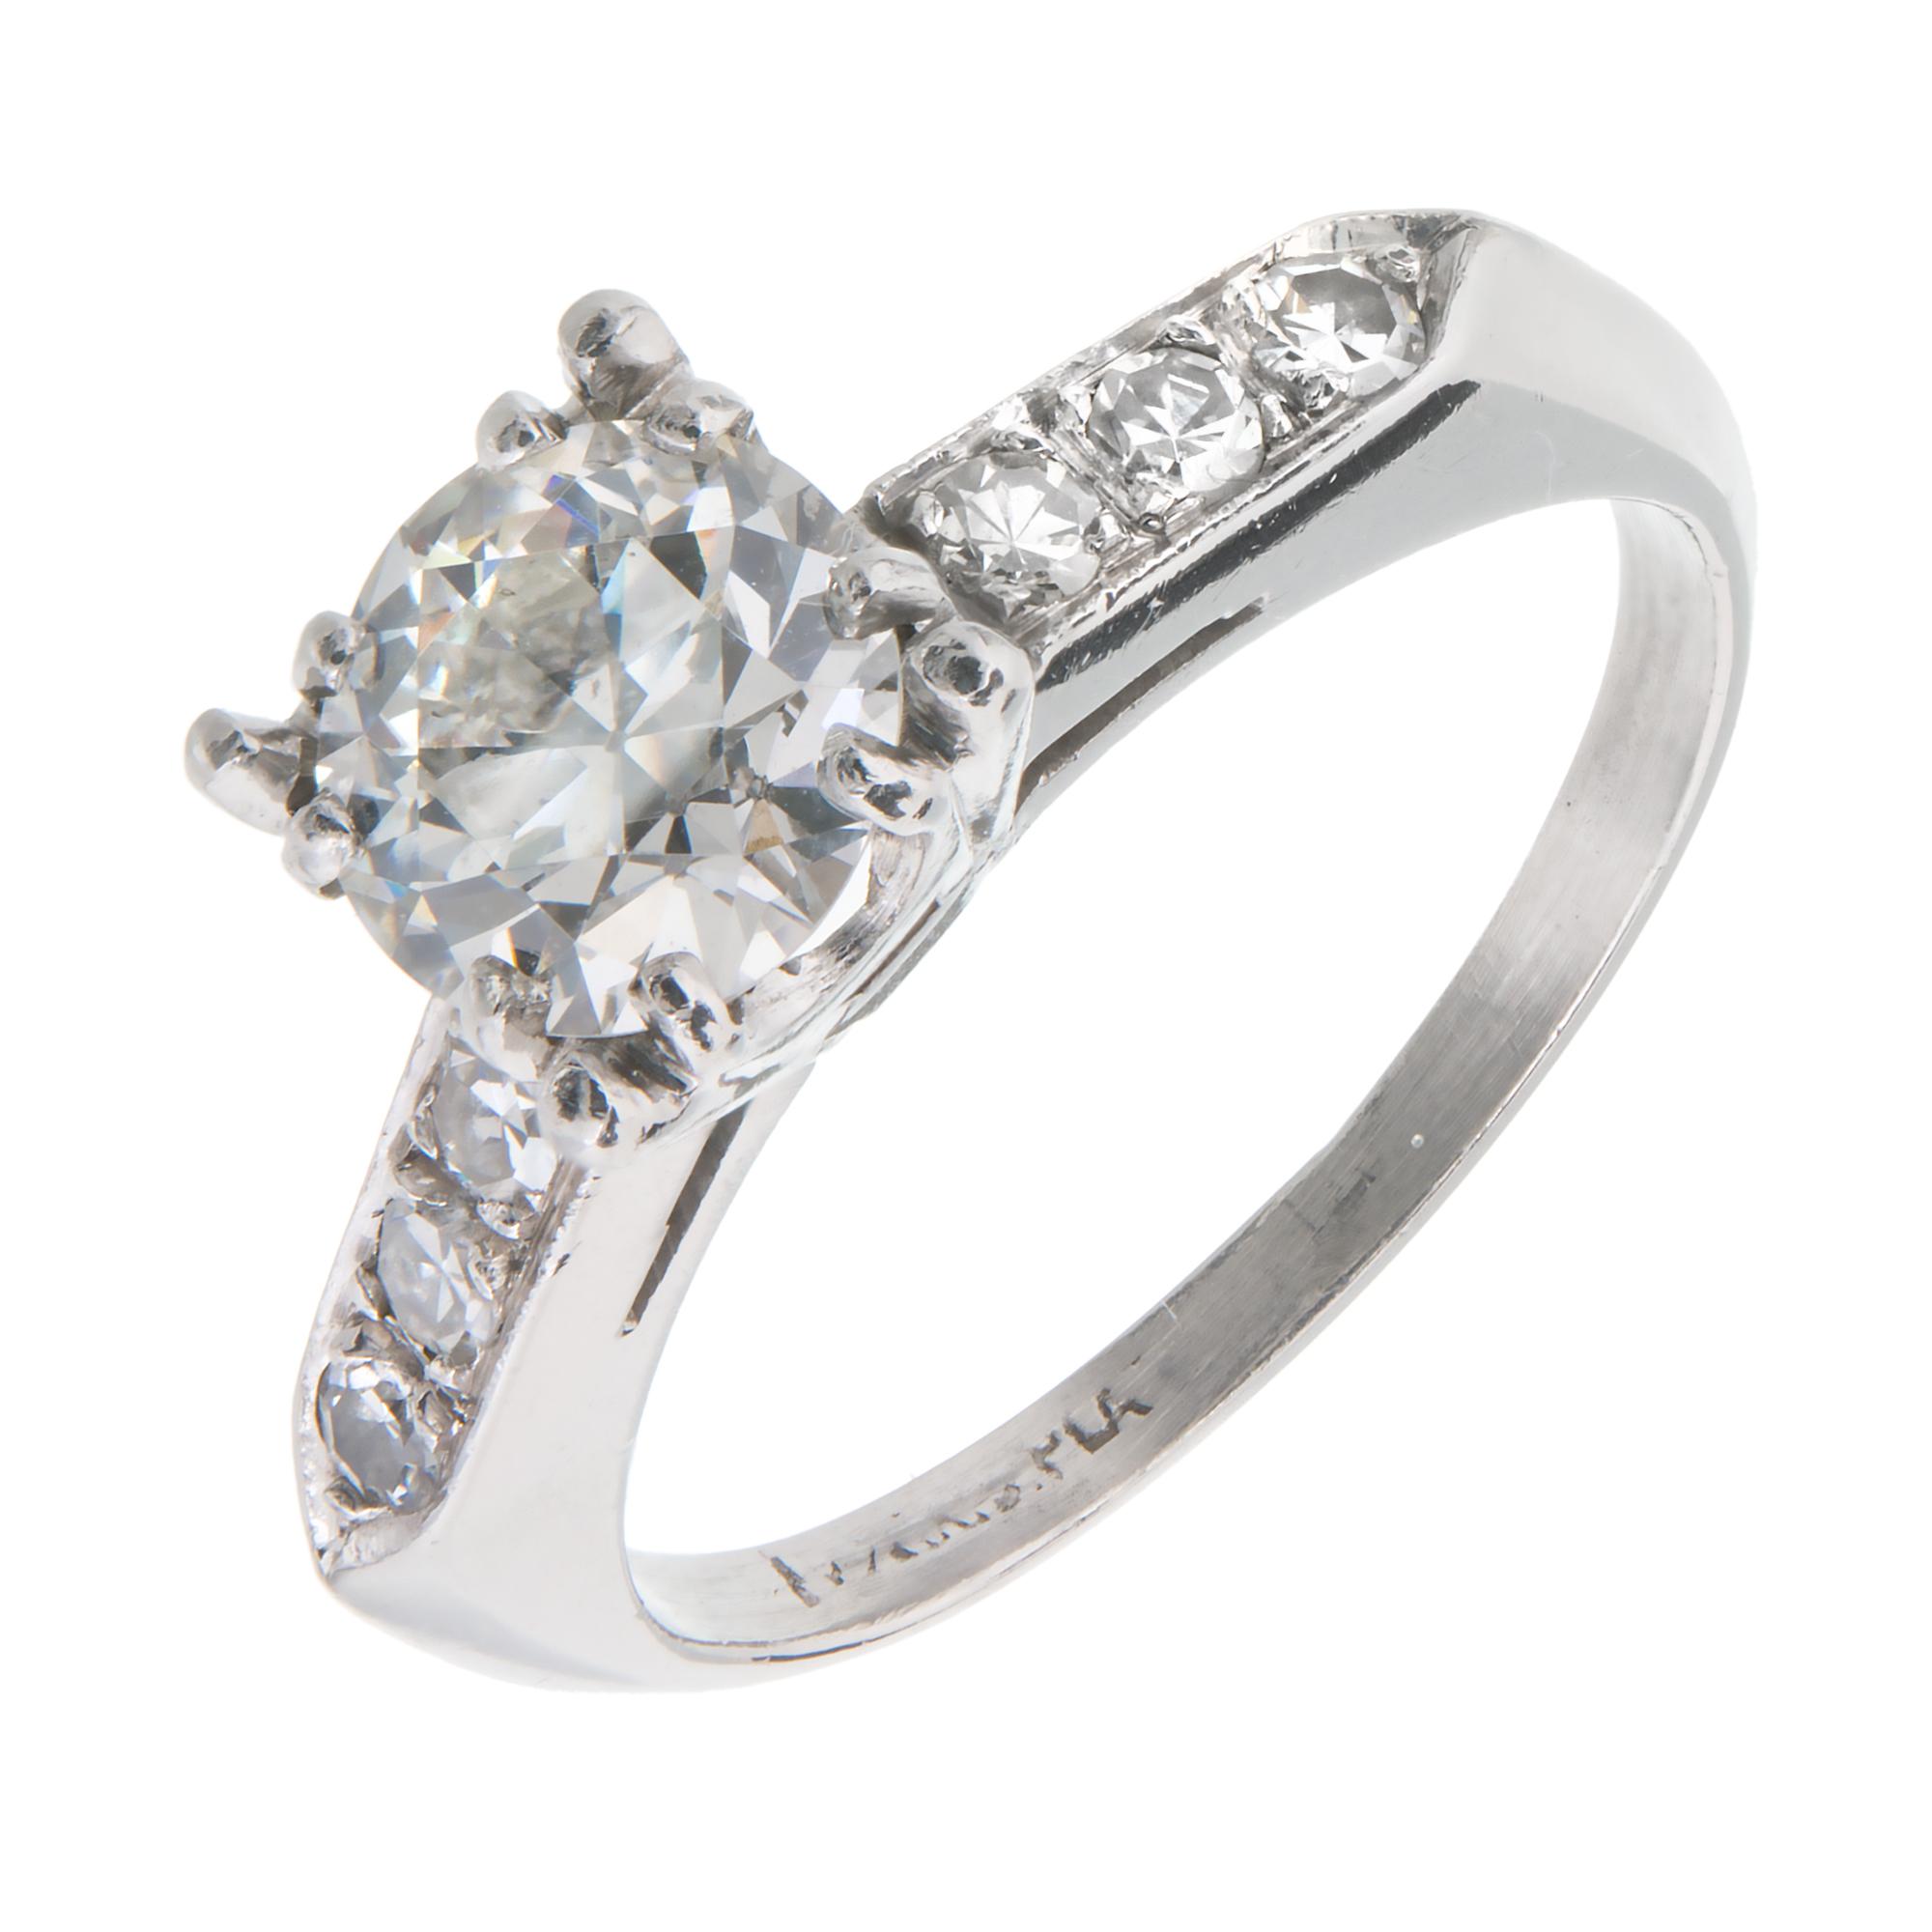 Vintage 1940 Transitional Cut Diamond Engagement Ring